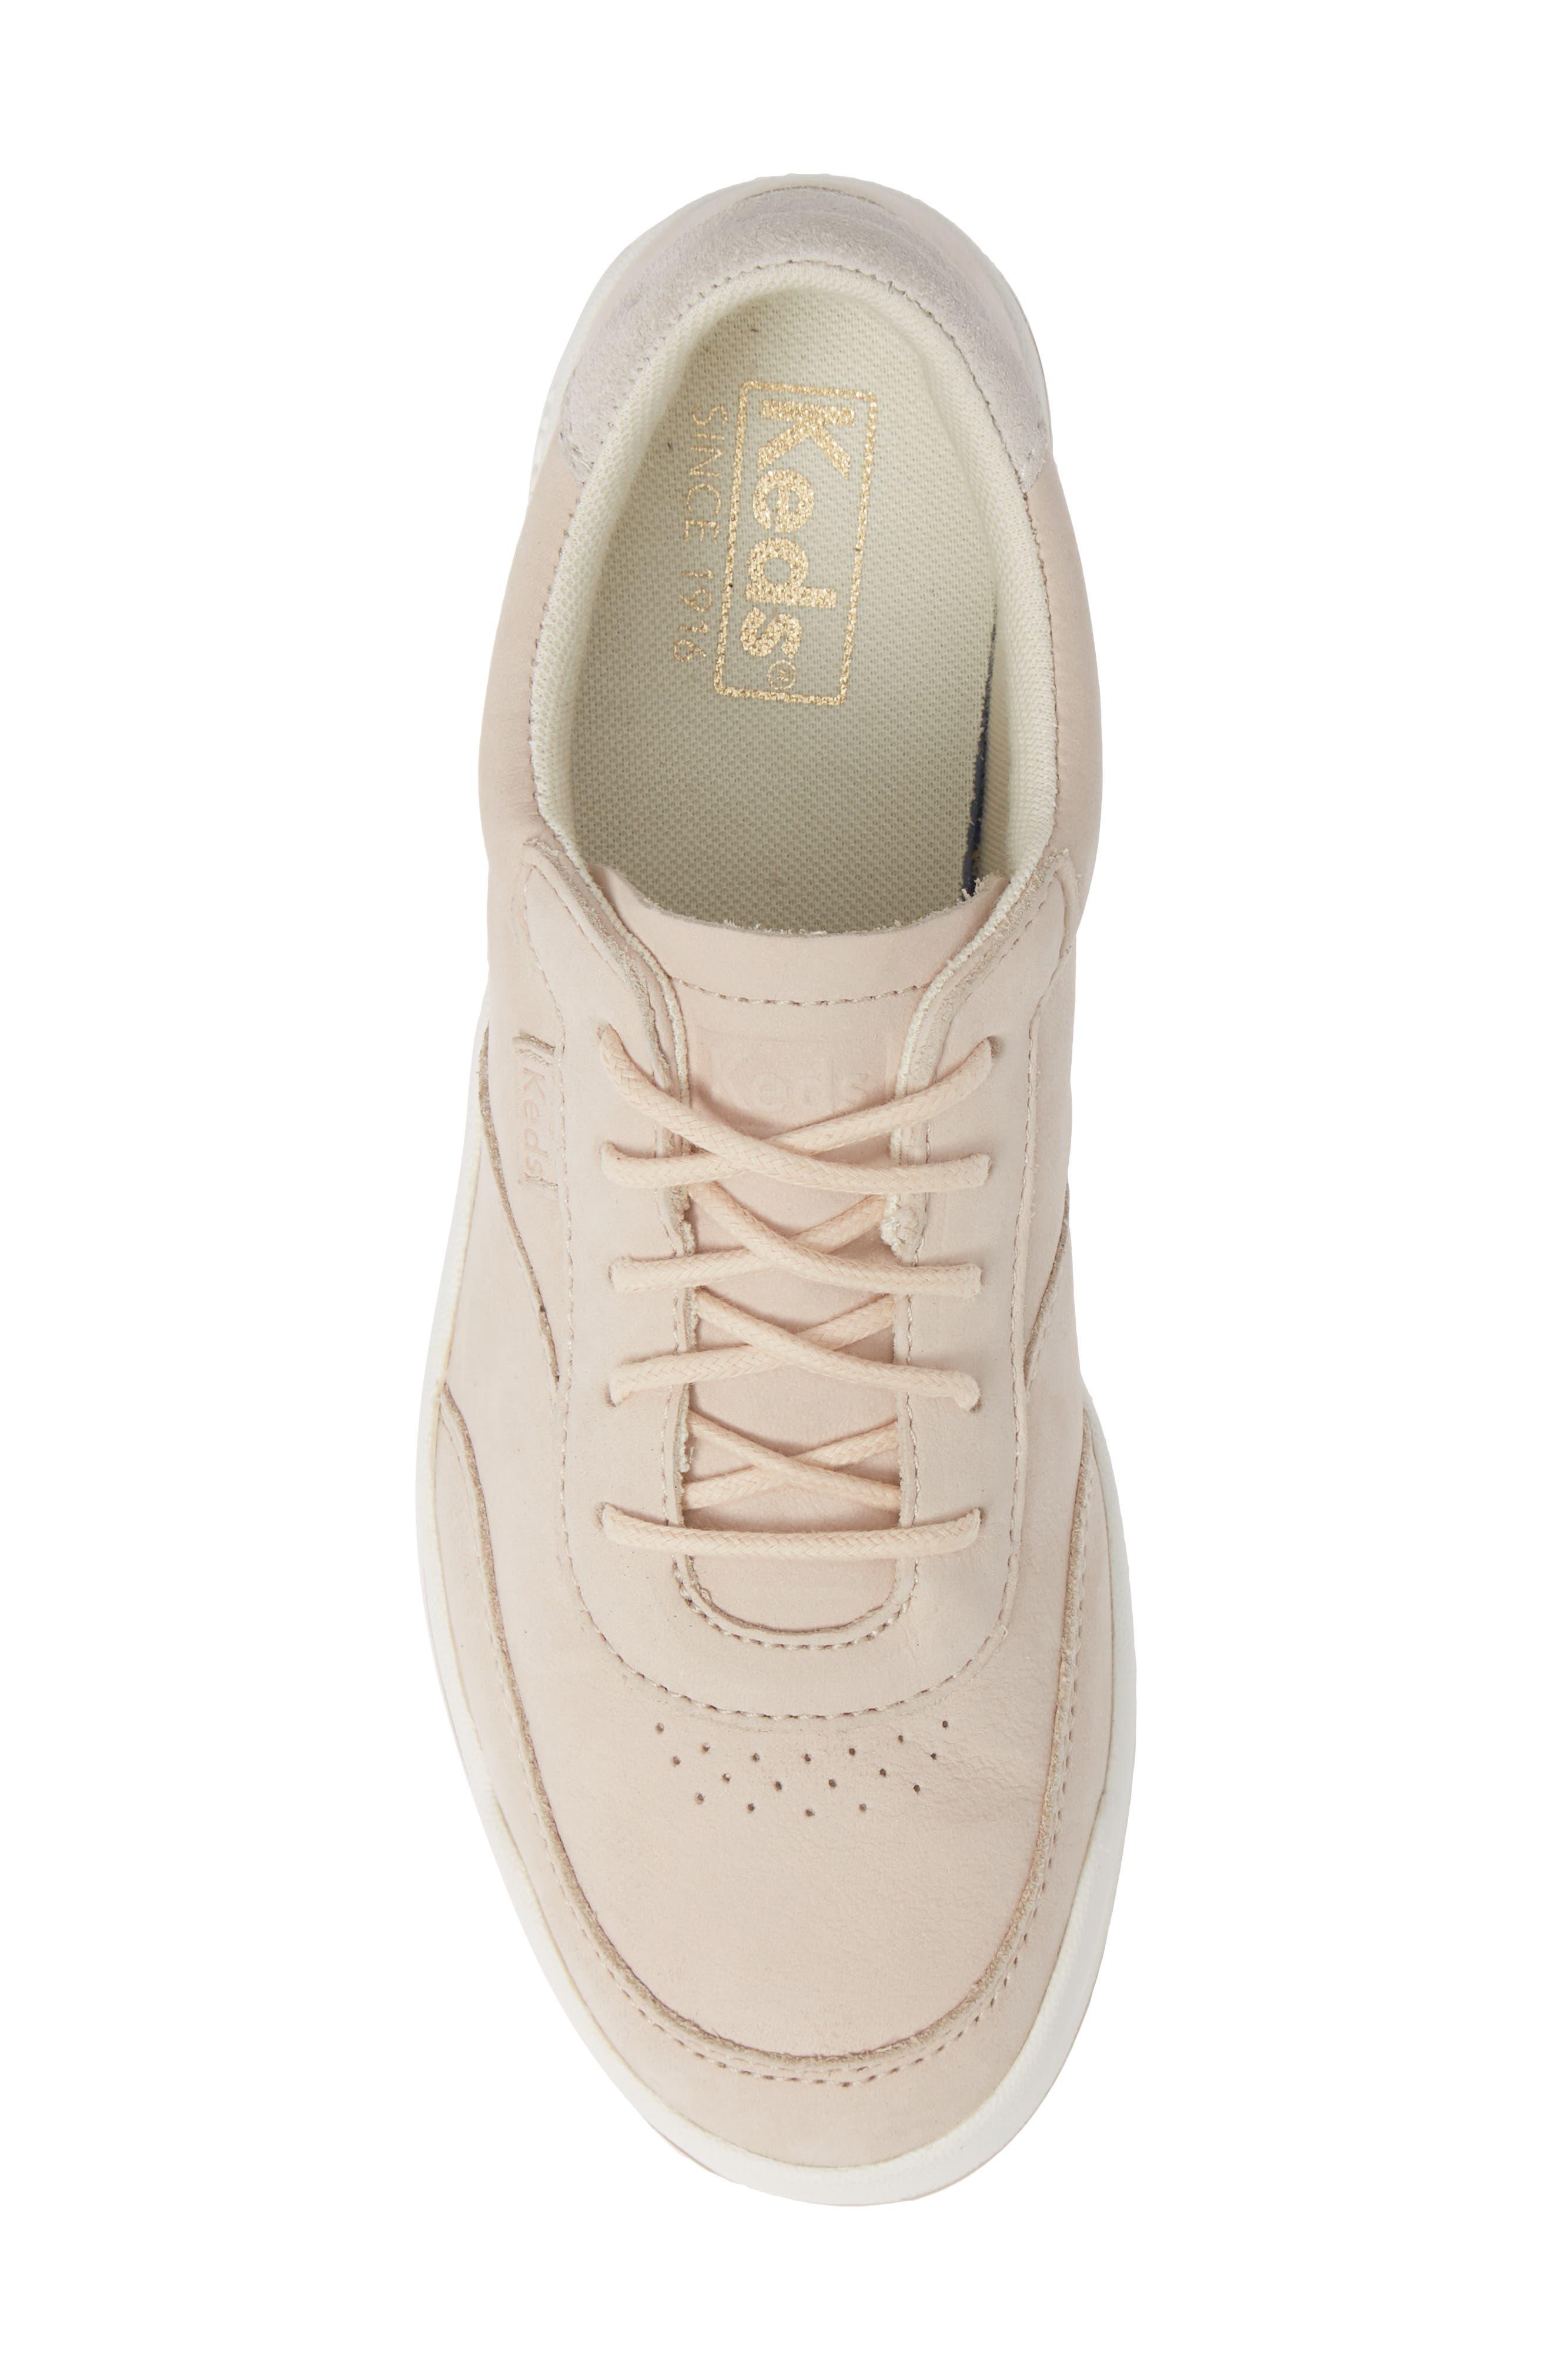 Match Point Sneaker,                             Alternate thumbnail 5, color,                             685